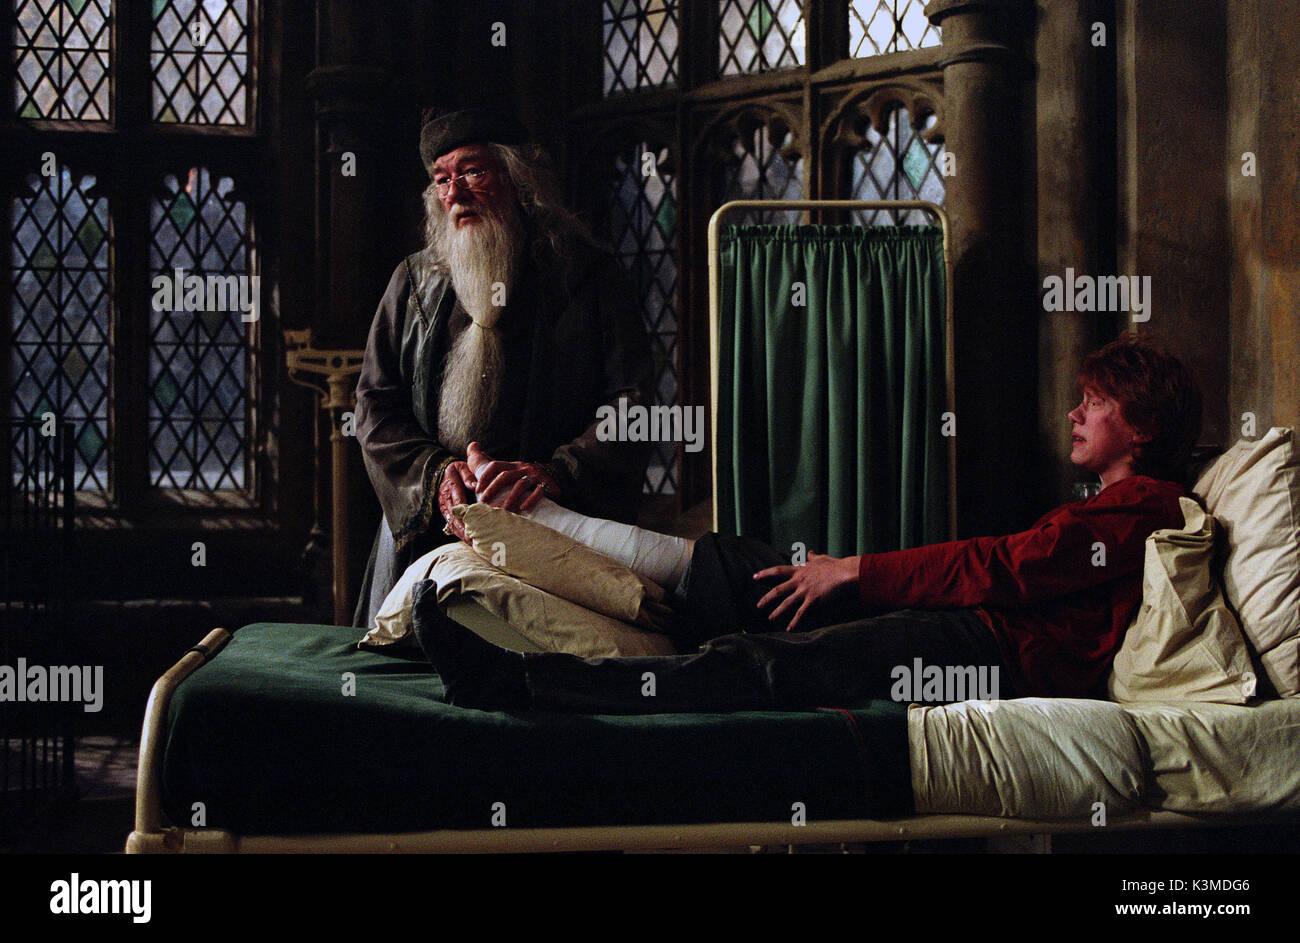 HARRY POTTER AND THE PRISONER OF AZKABAN [BR / US 2004] [L-R] MICHAEL GAMBON as Professor Dumbledore, RUPERT GRINT as Ron Weasley     Date: 2004 - Stock Image